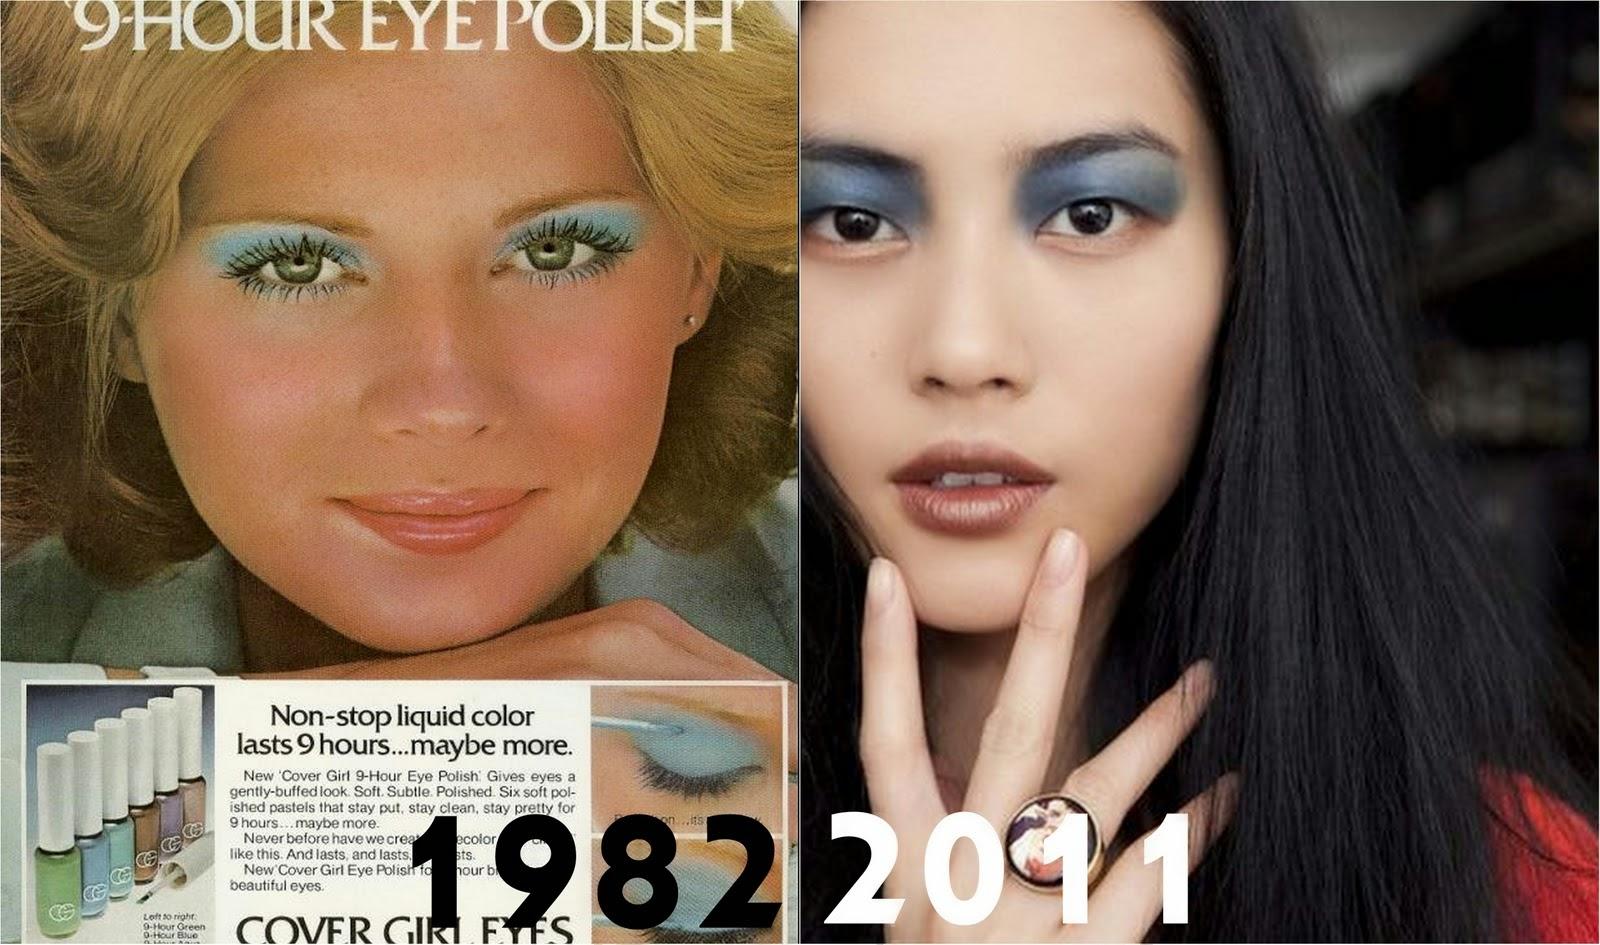 80s makeup compared to 2011 makeup